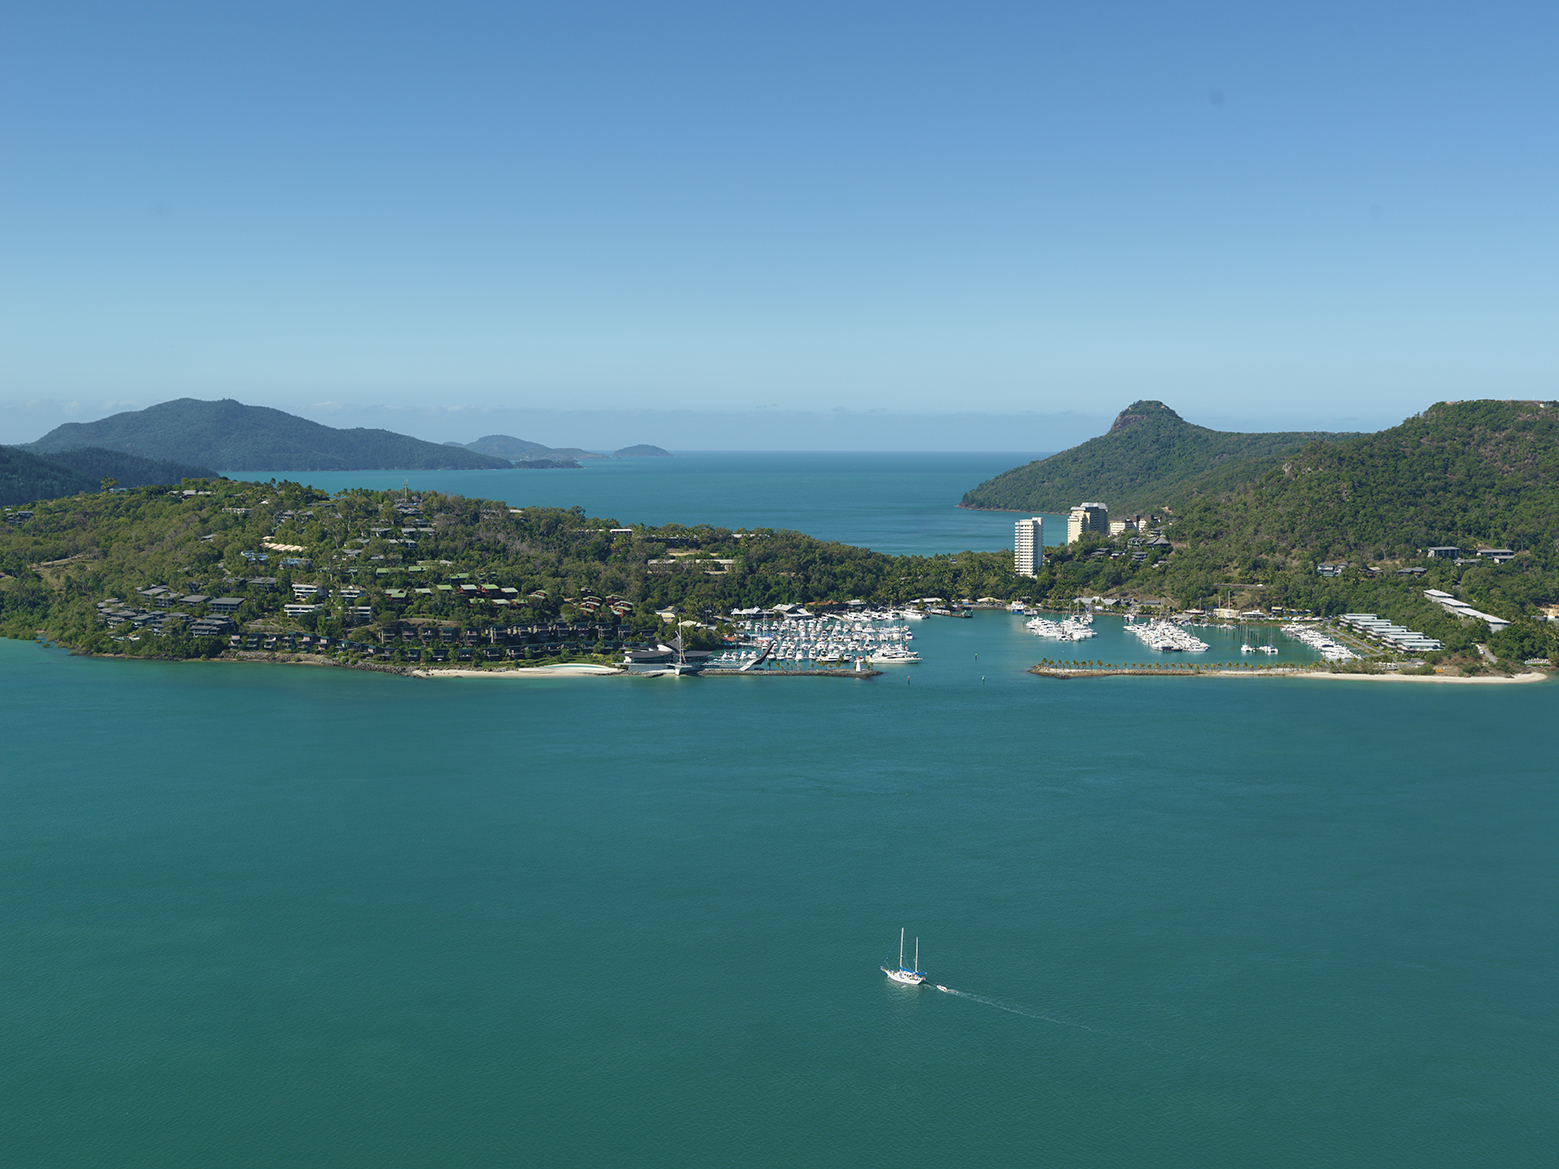 Đảo Hamilton (Queensland) – Wikipedia tiếng Việt